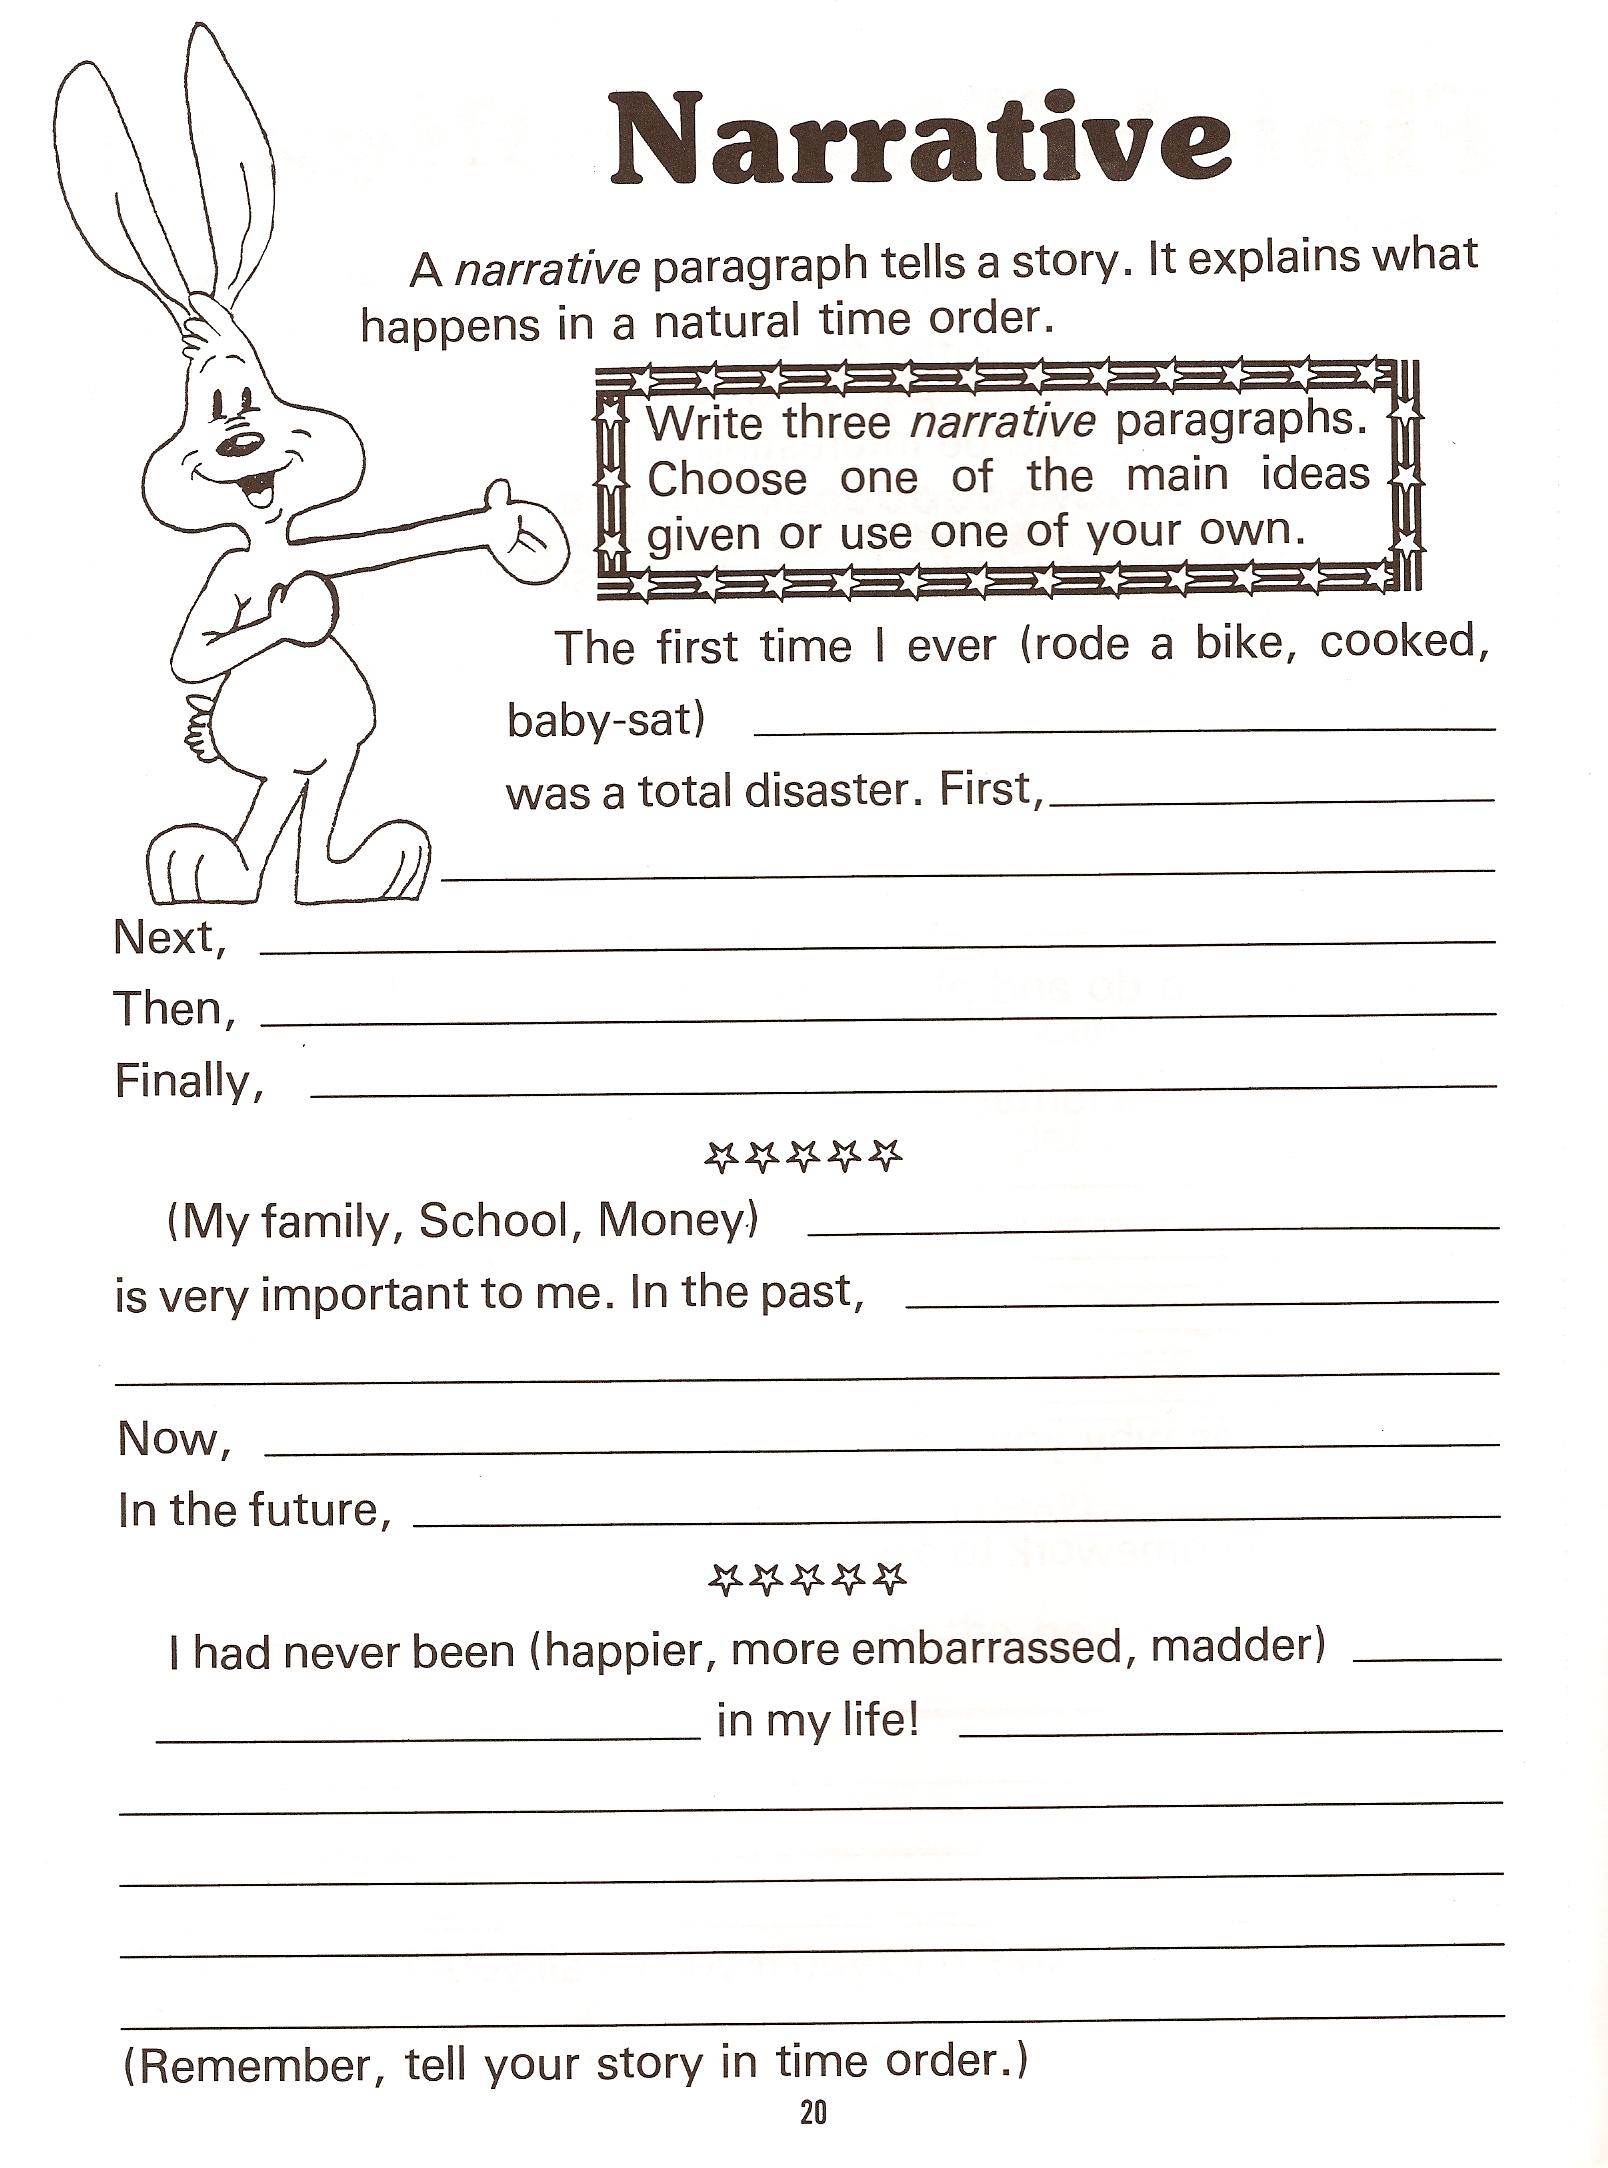 004 Best Solutions Of Narrationssay My Narrative Family Love Lovely Description Imagexample Vs Descriptive Wondrous Essay Studymode And Writing Igcse Ppt Full